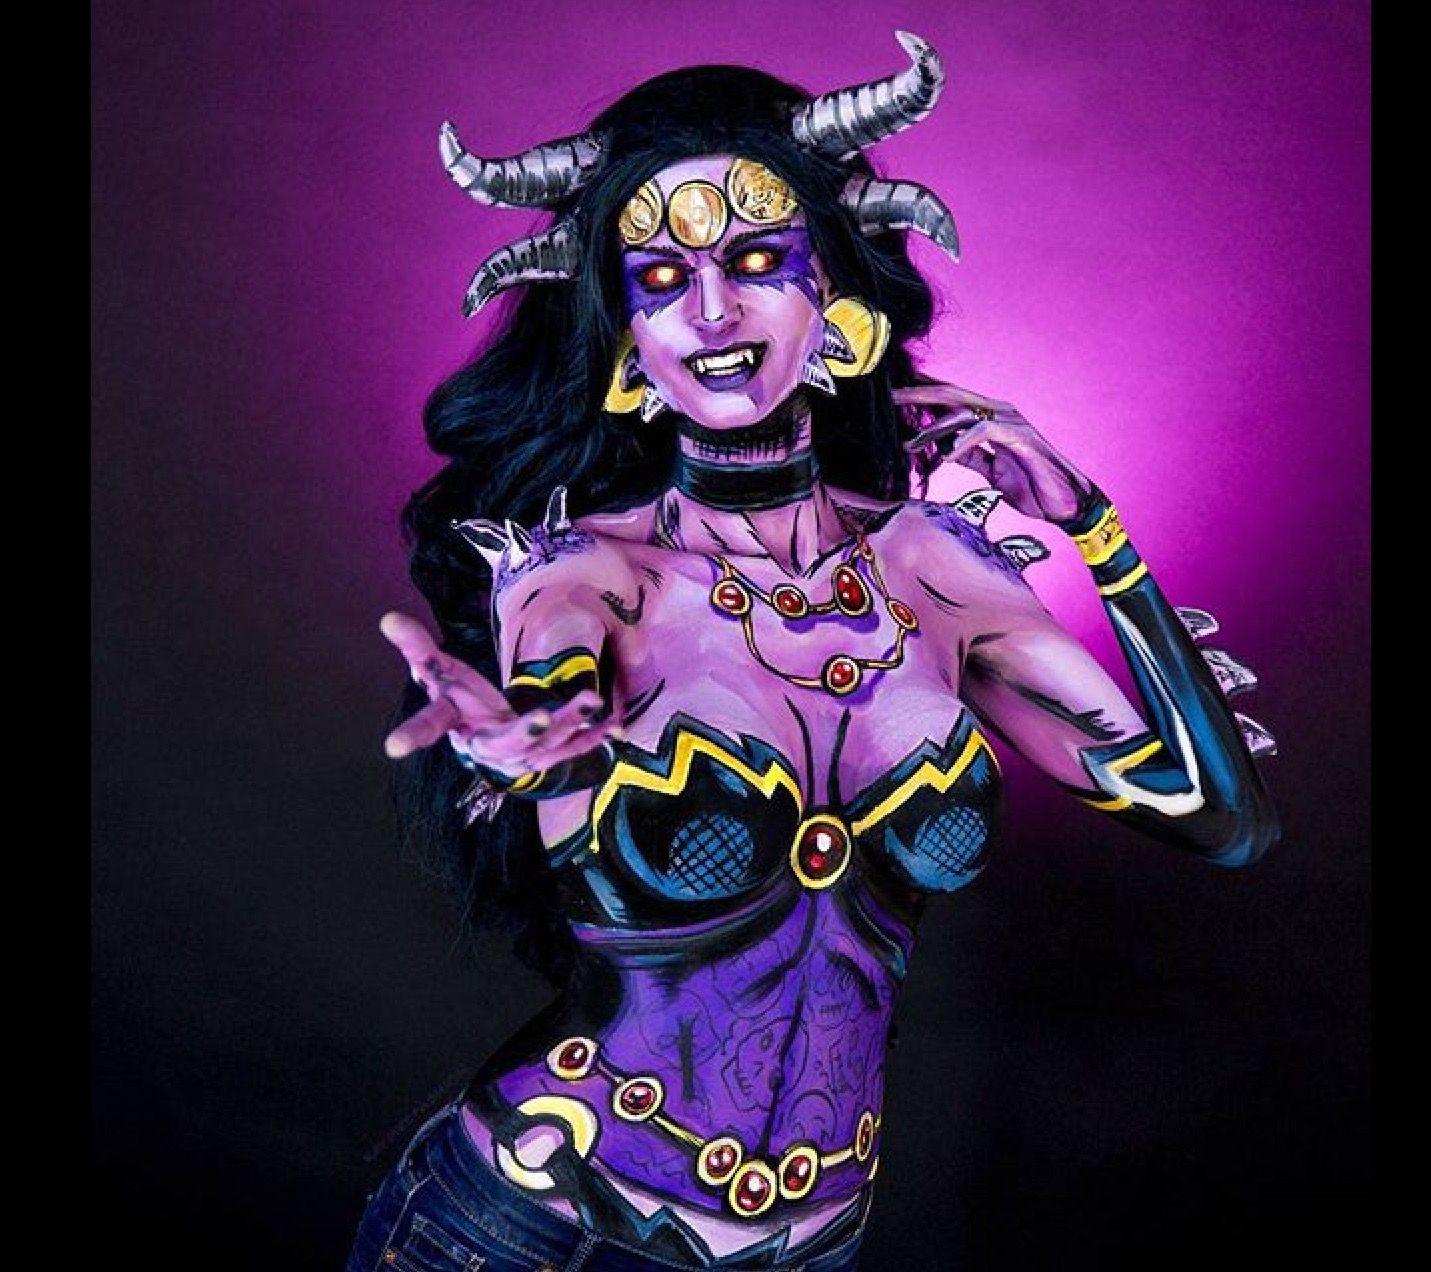 Duas Caras Kay Pike | Body painting, Kay pike, The incredibles